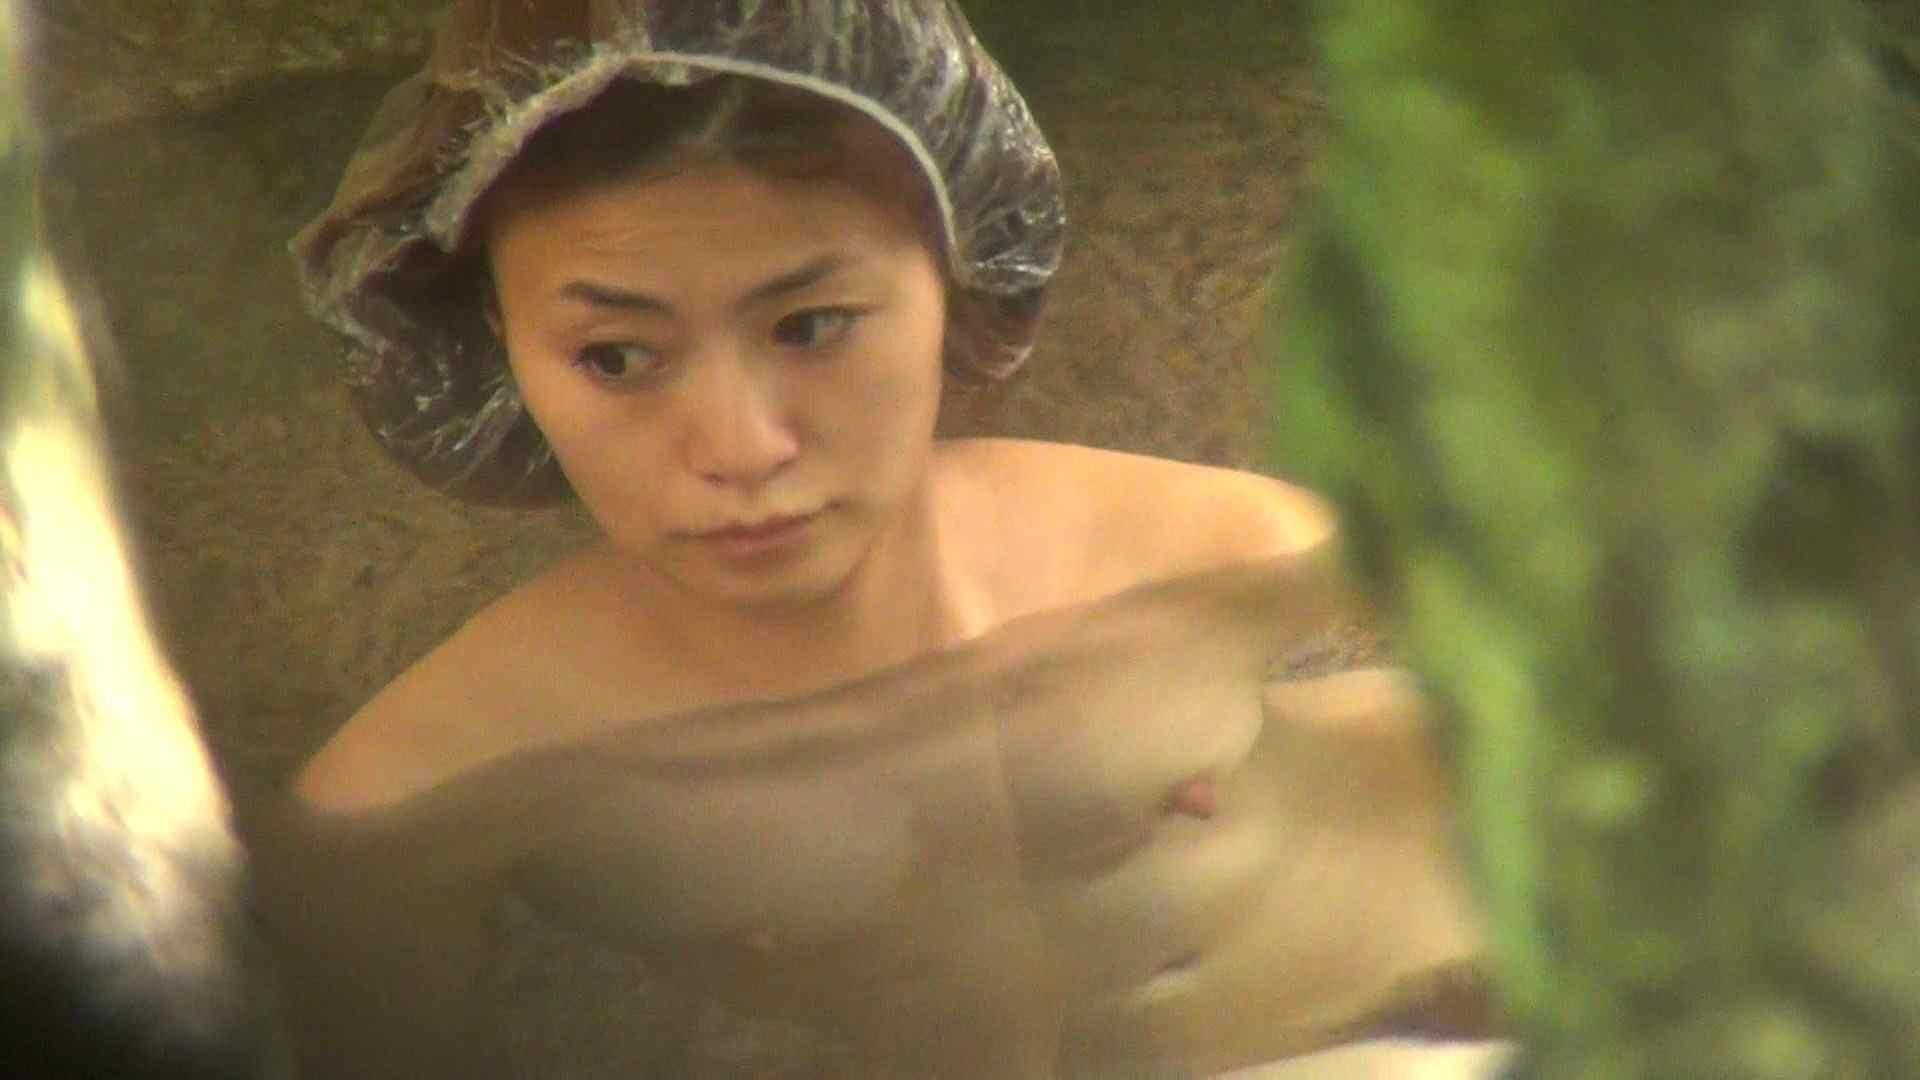 Aquaな露天風呂Vol.264 HなOL | 露天  54pic 10